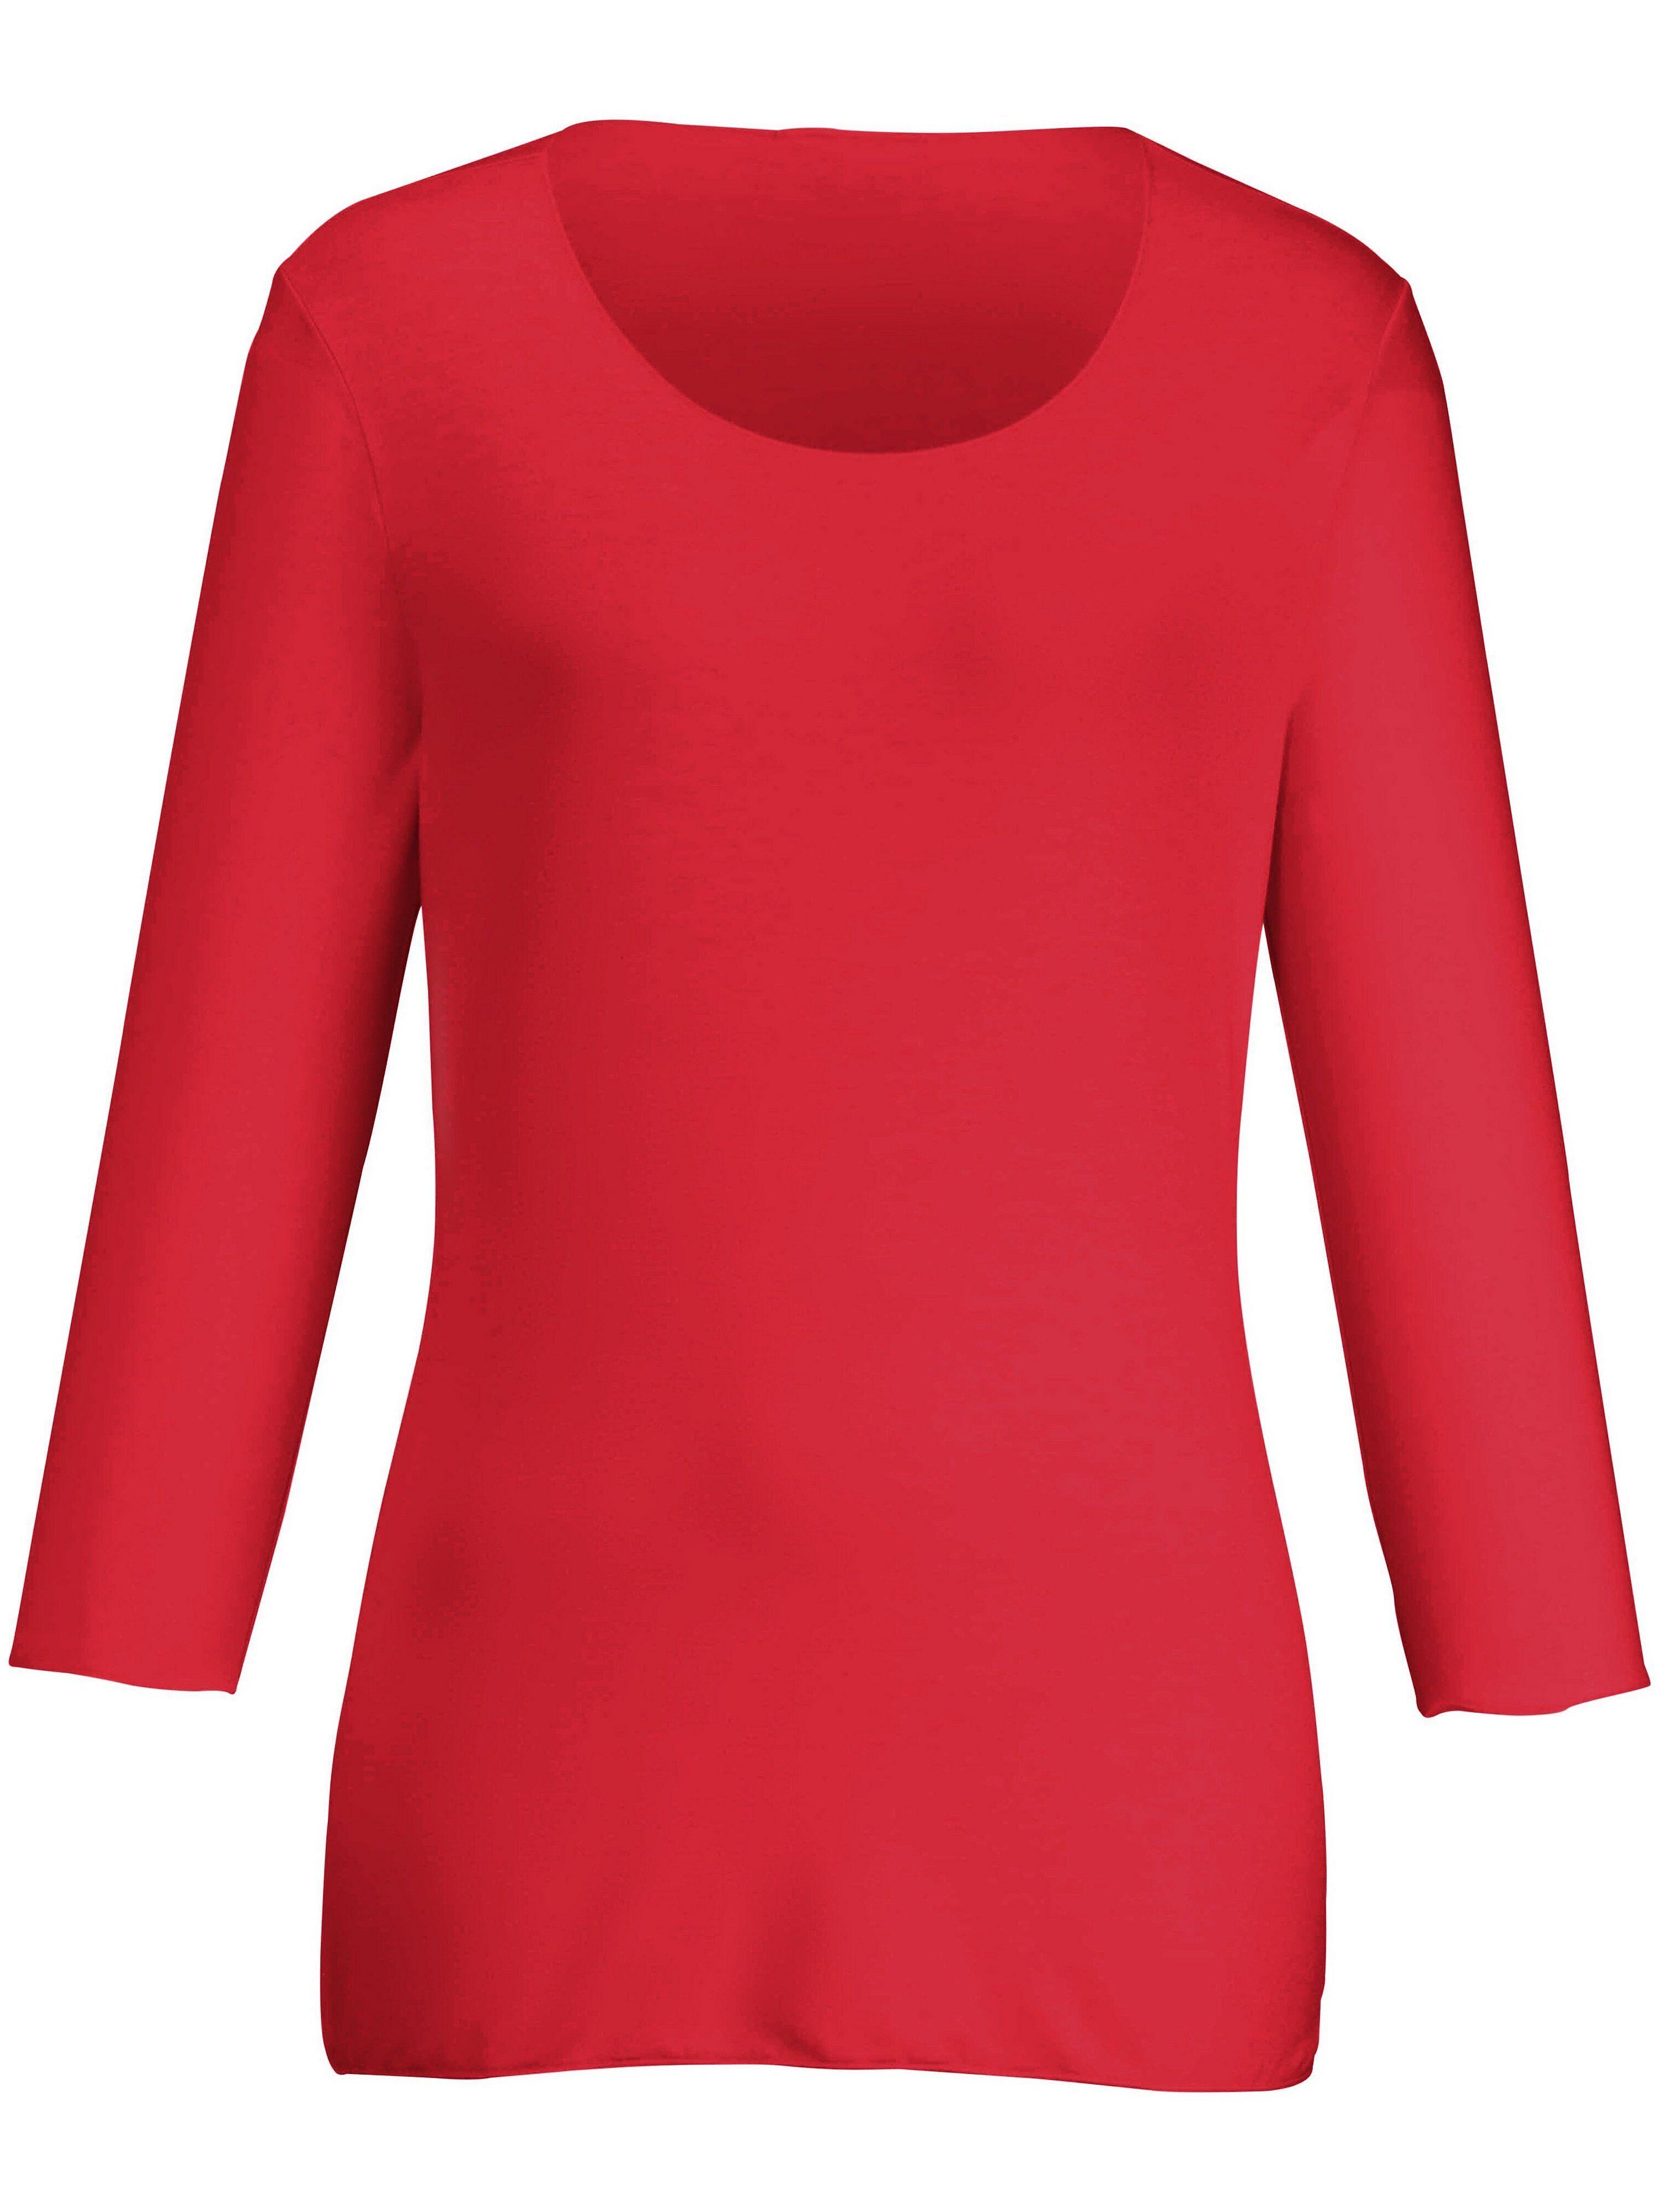 Peter Hahn Le T-shirt manches 3/4  Peter Hahn rouge  - Femme - 38